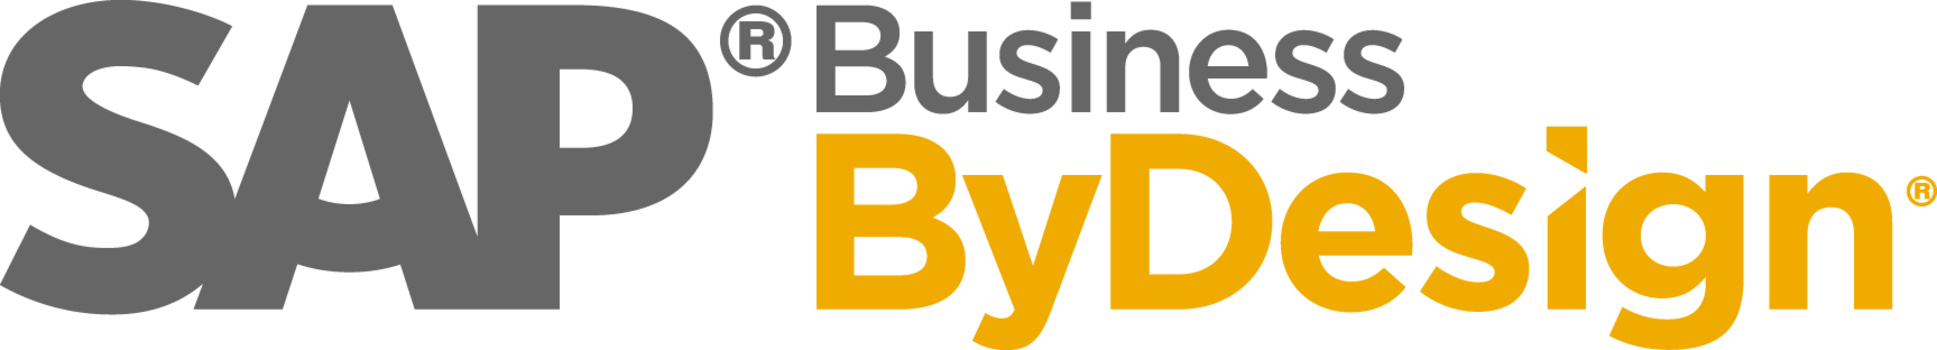 SAP_Business_ByDesign-1